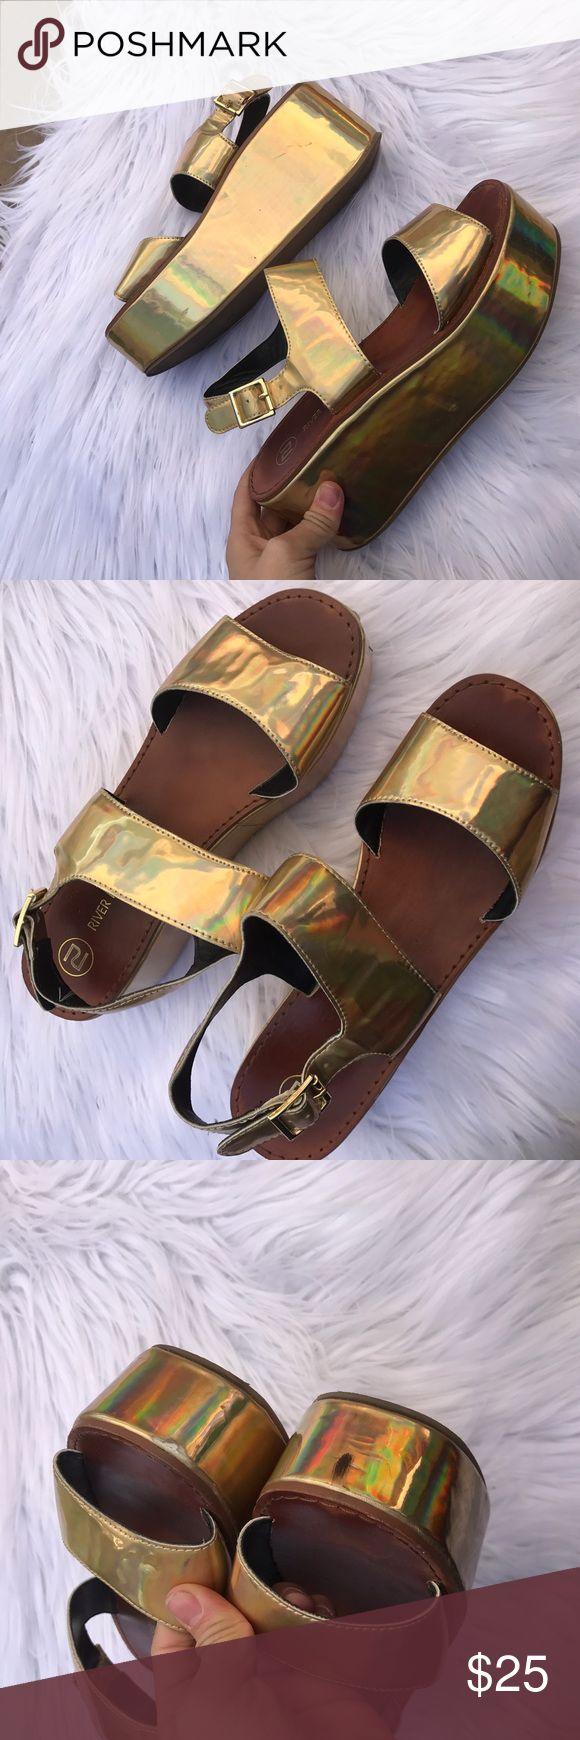 RIVER ISLAND SZ 9 HOLOGRAPHIC GOLD PLATFORM SHOES Cute platform sandals River Island Shoes